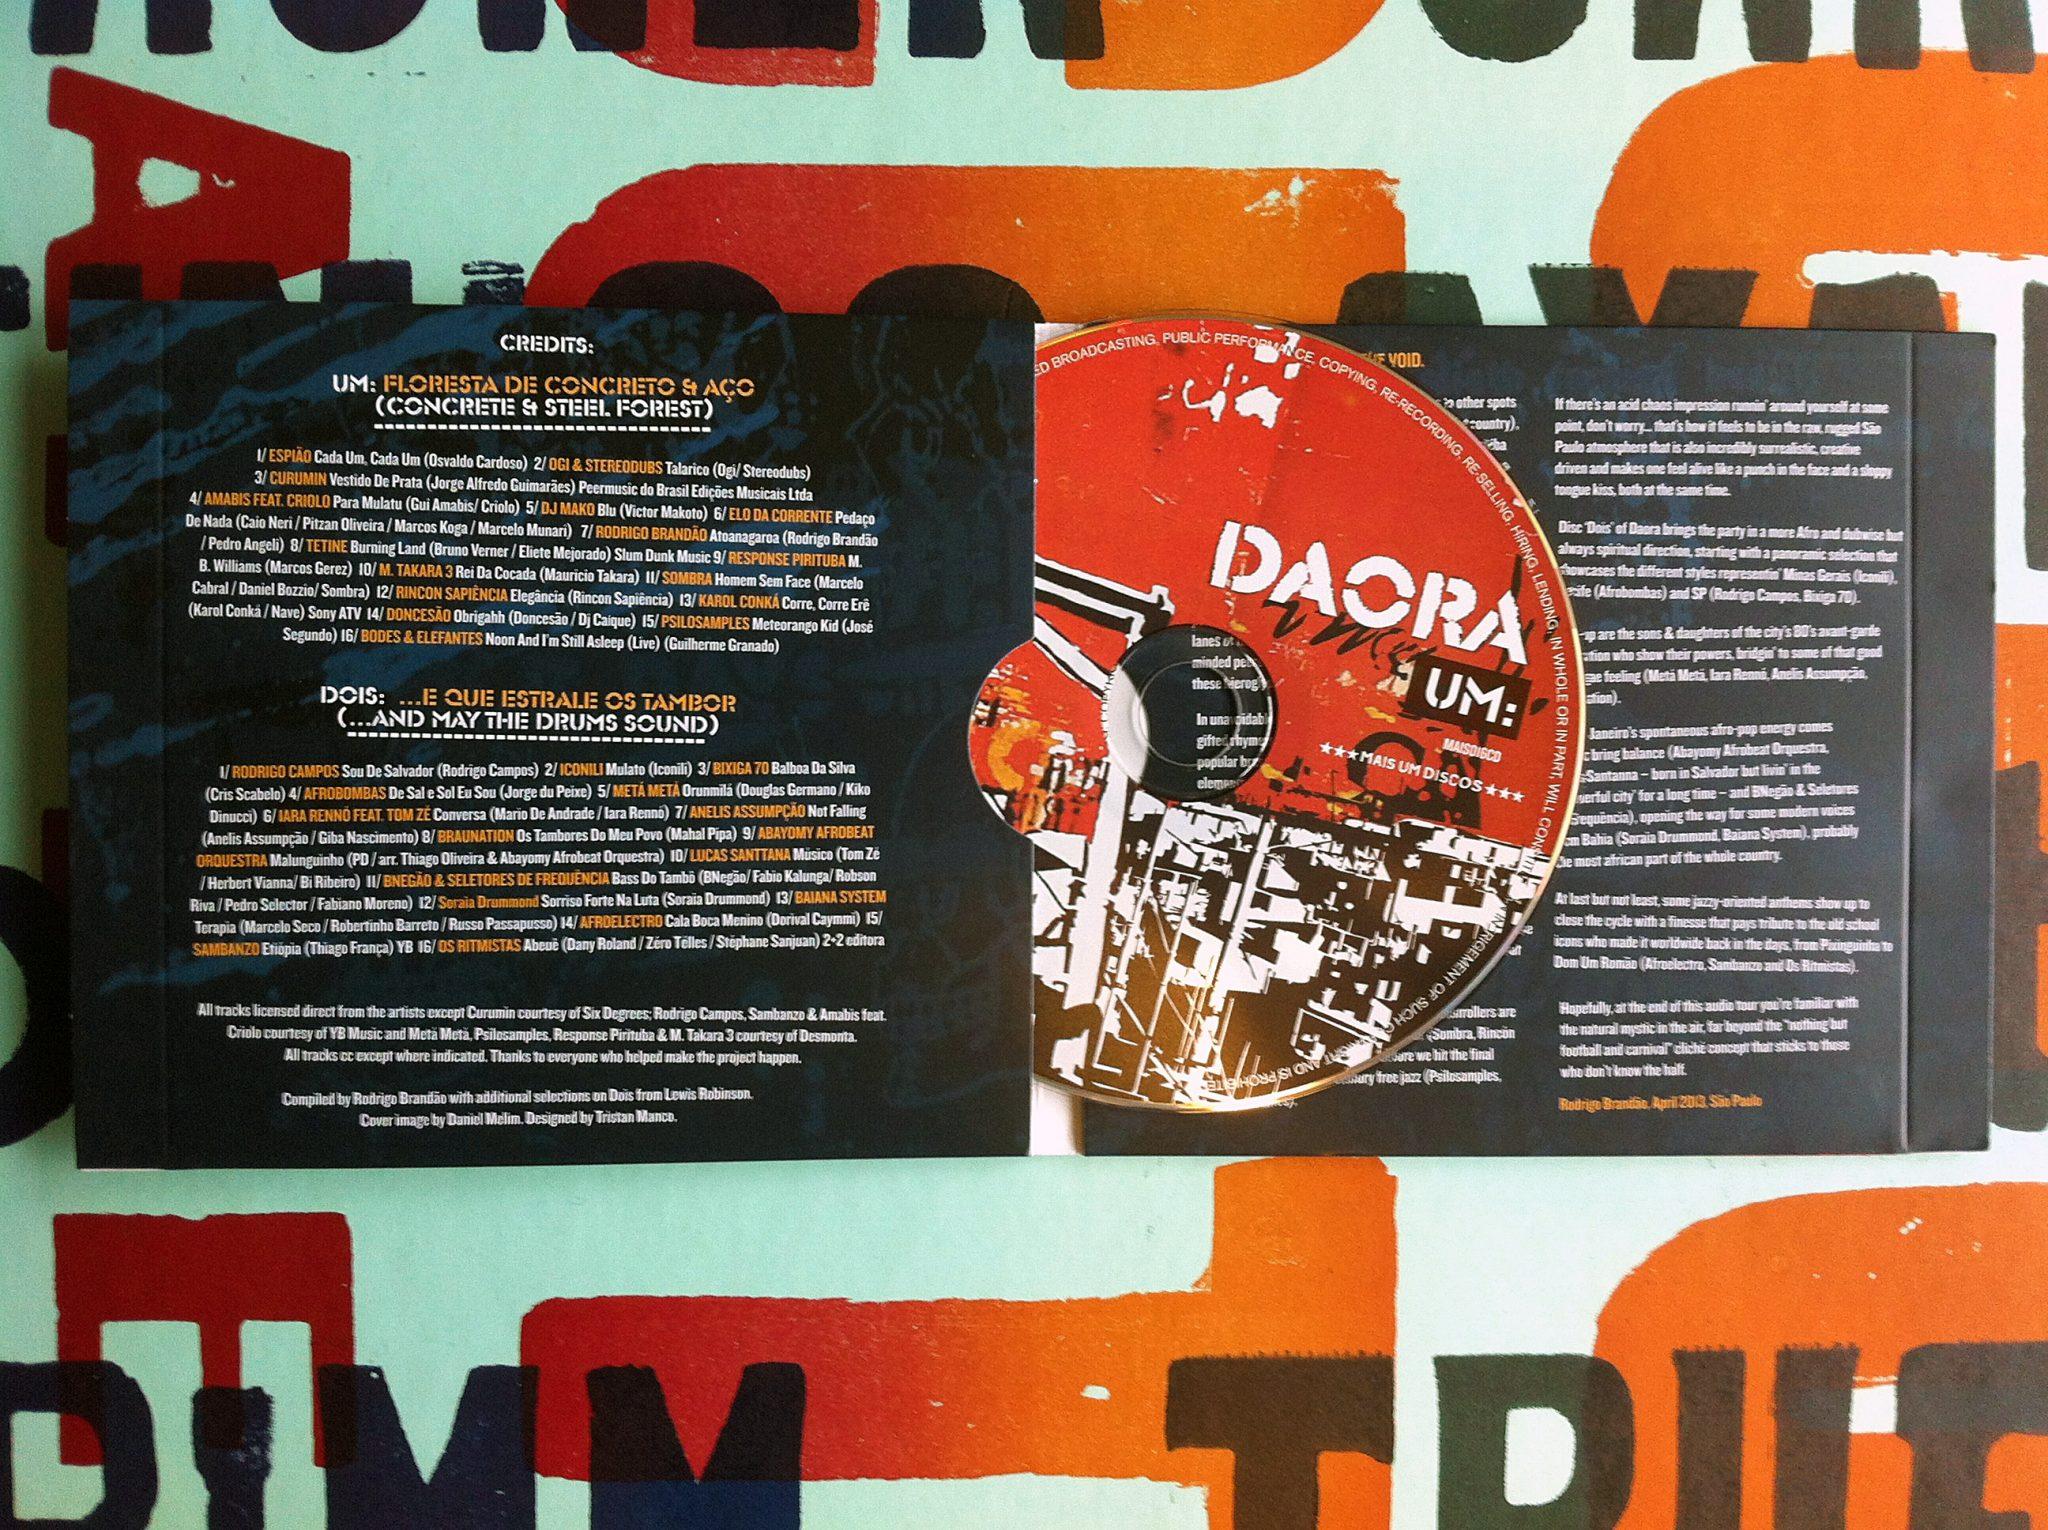 Daora Music Packaging, Mais Um Discos